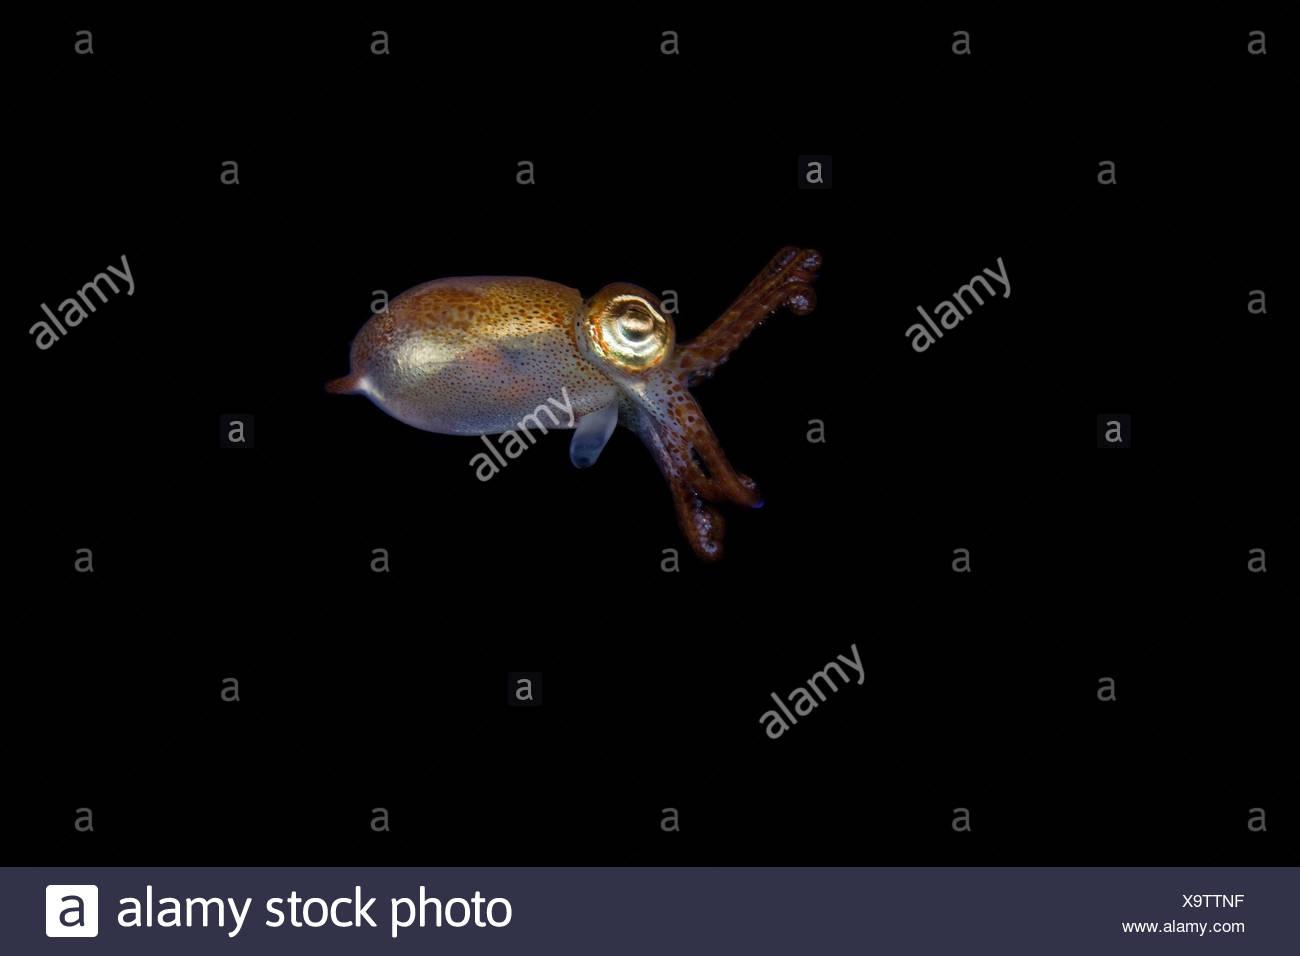 Atlantic Bobtail seppie 2 cm Dimensioni Sepiola atlantica Stromsholmen Oceano Atlantico dalla Norvegia Immagini Stock